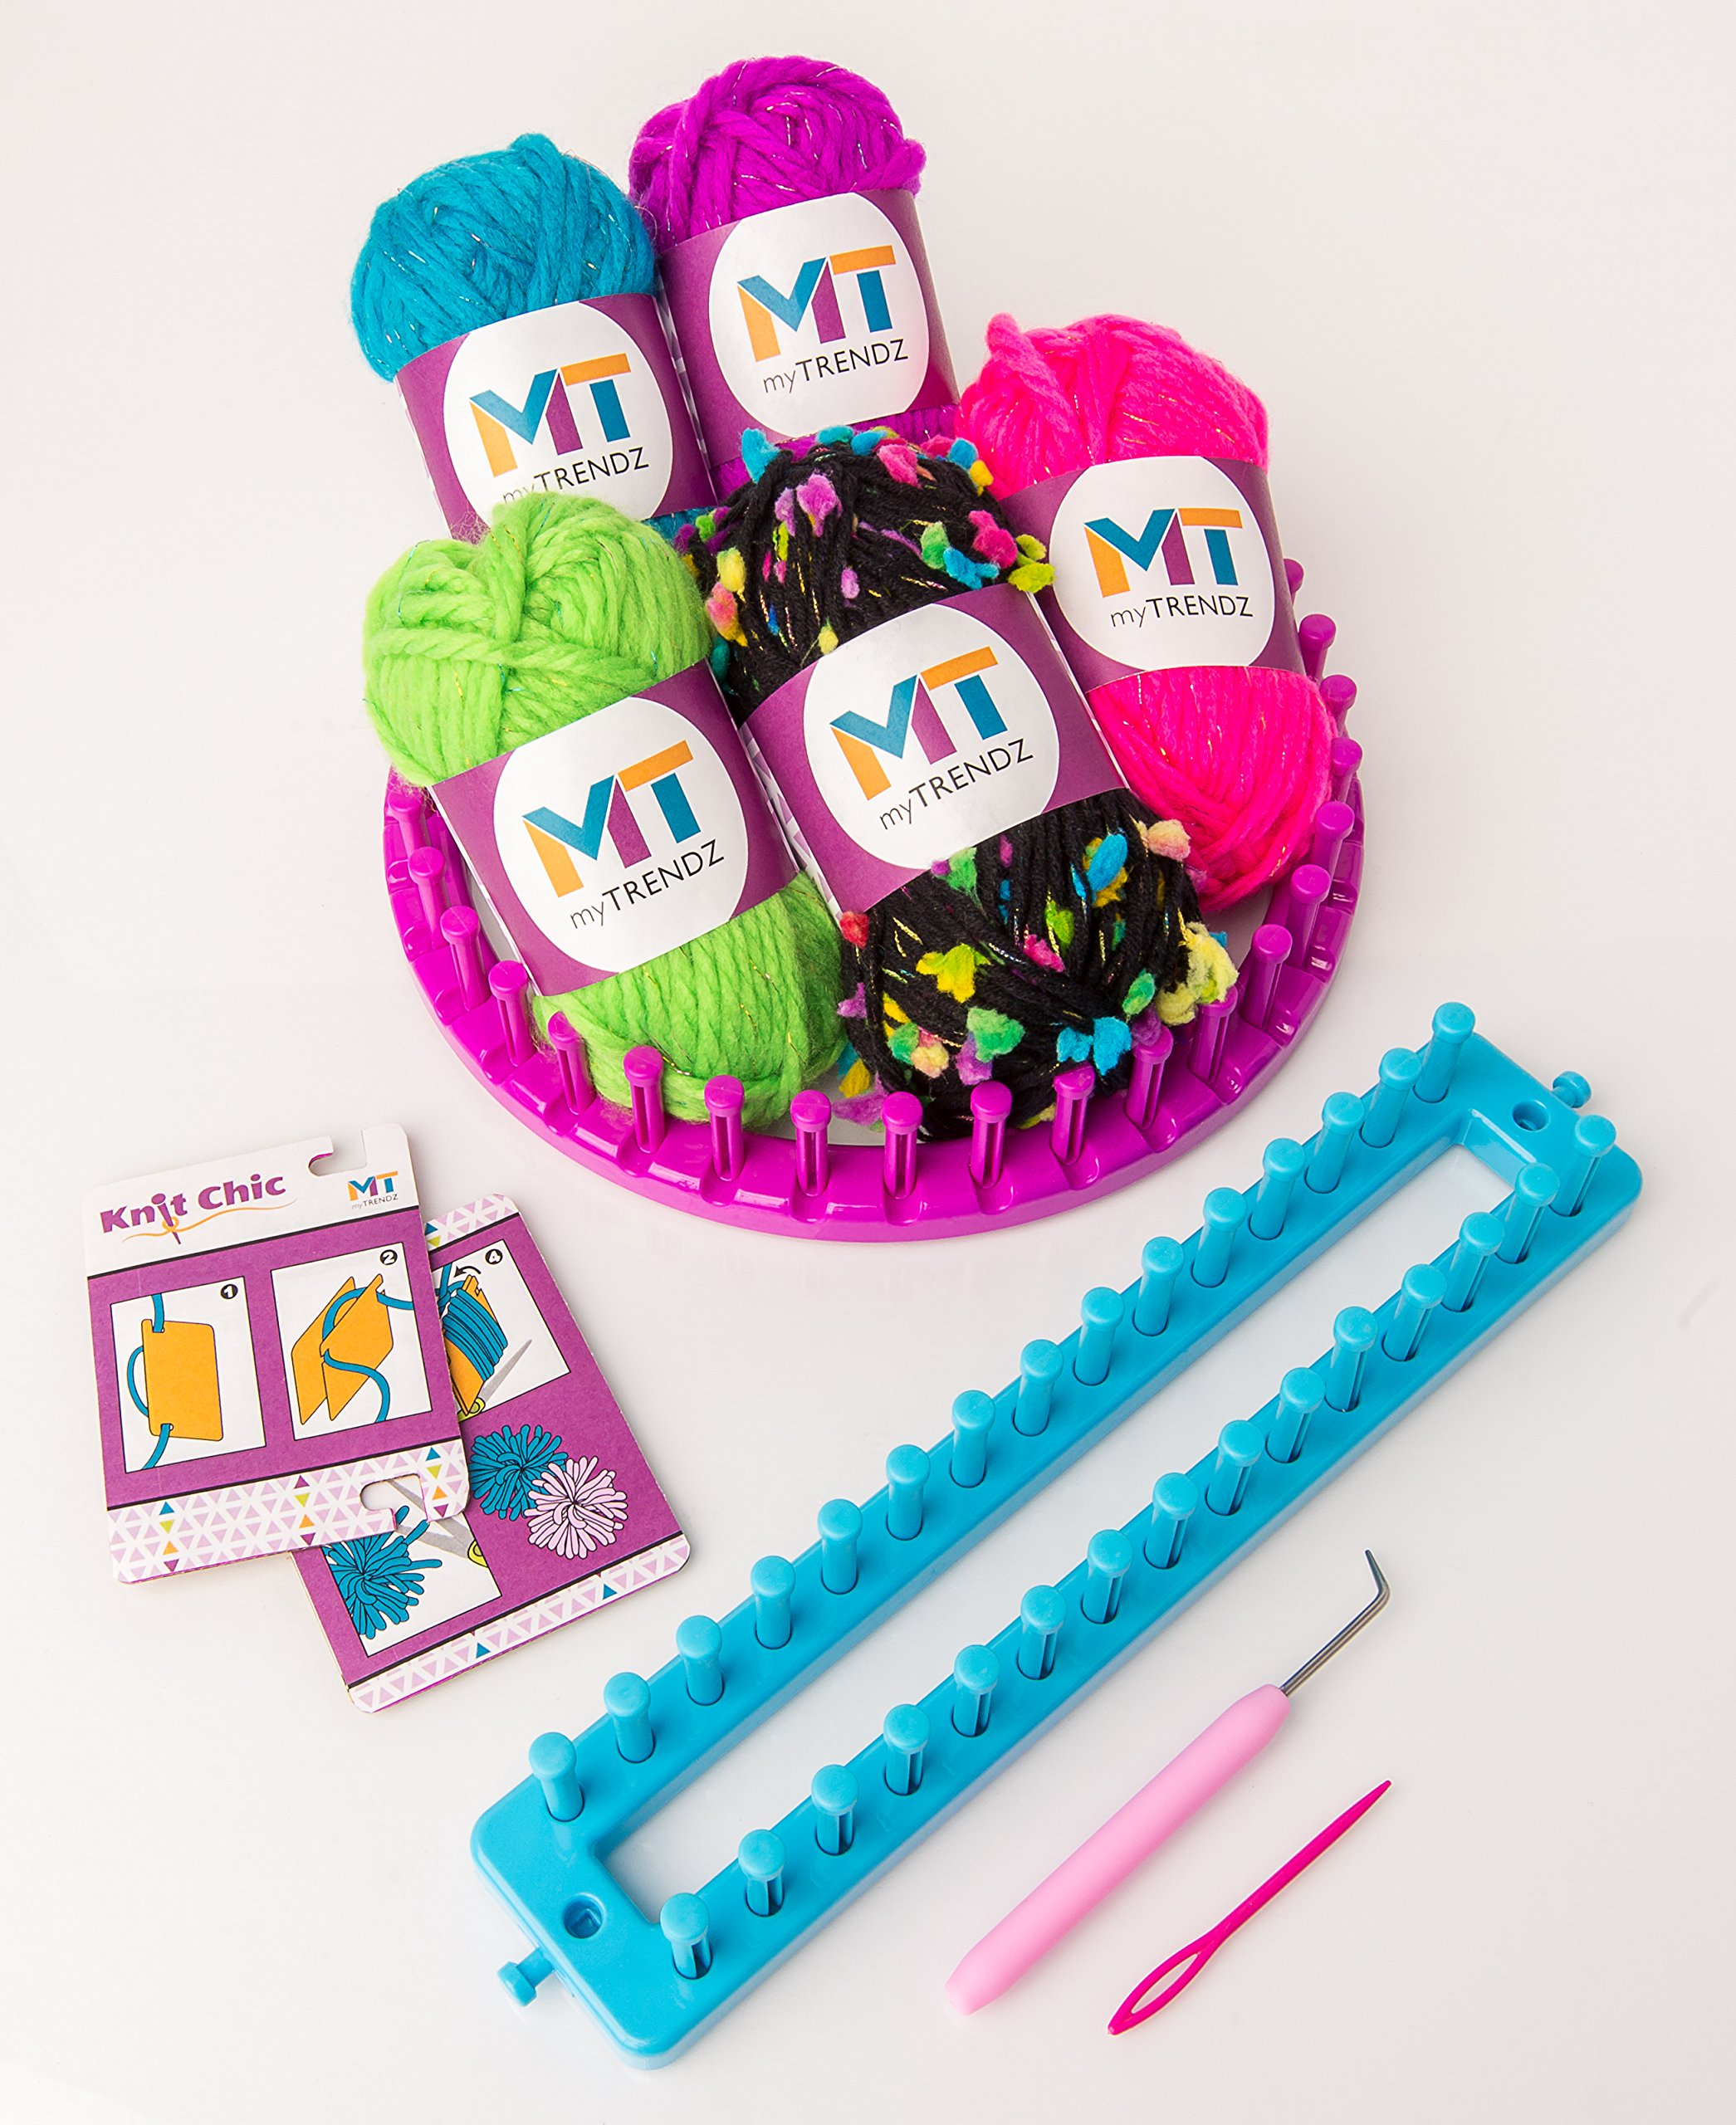 My Trendz Knit Chic Starter Children's Knitting Kit - Create Your Own Fashion Trends!